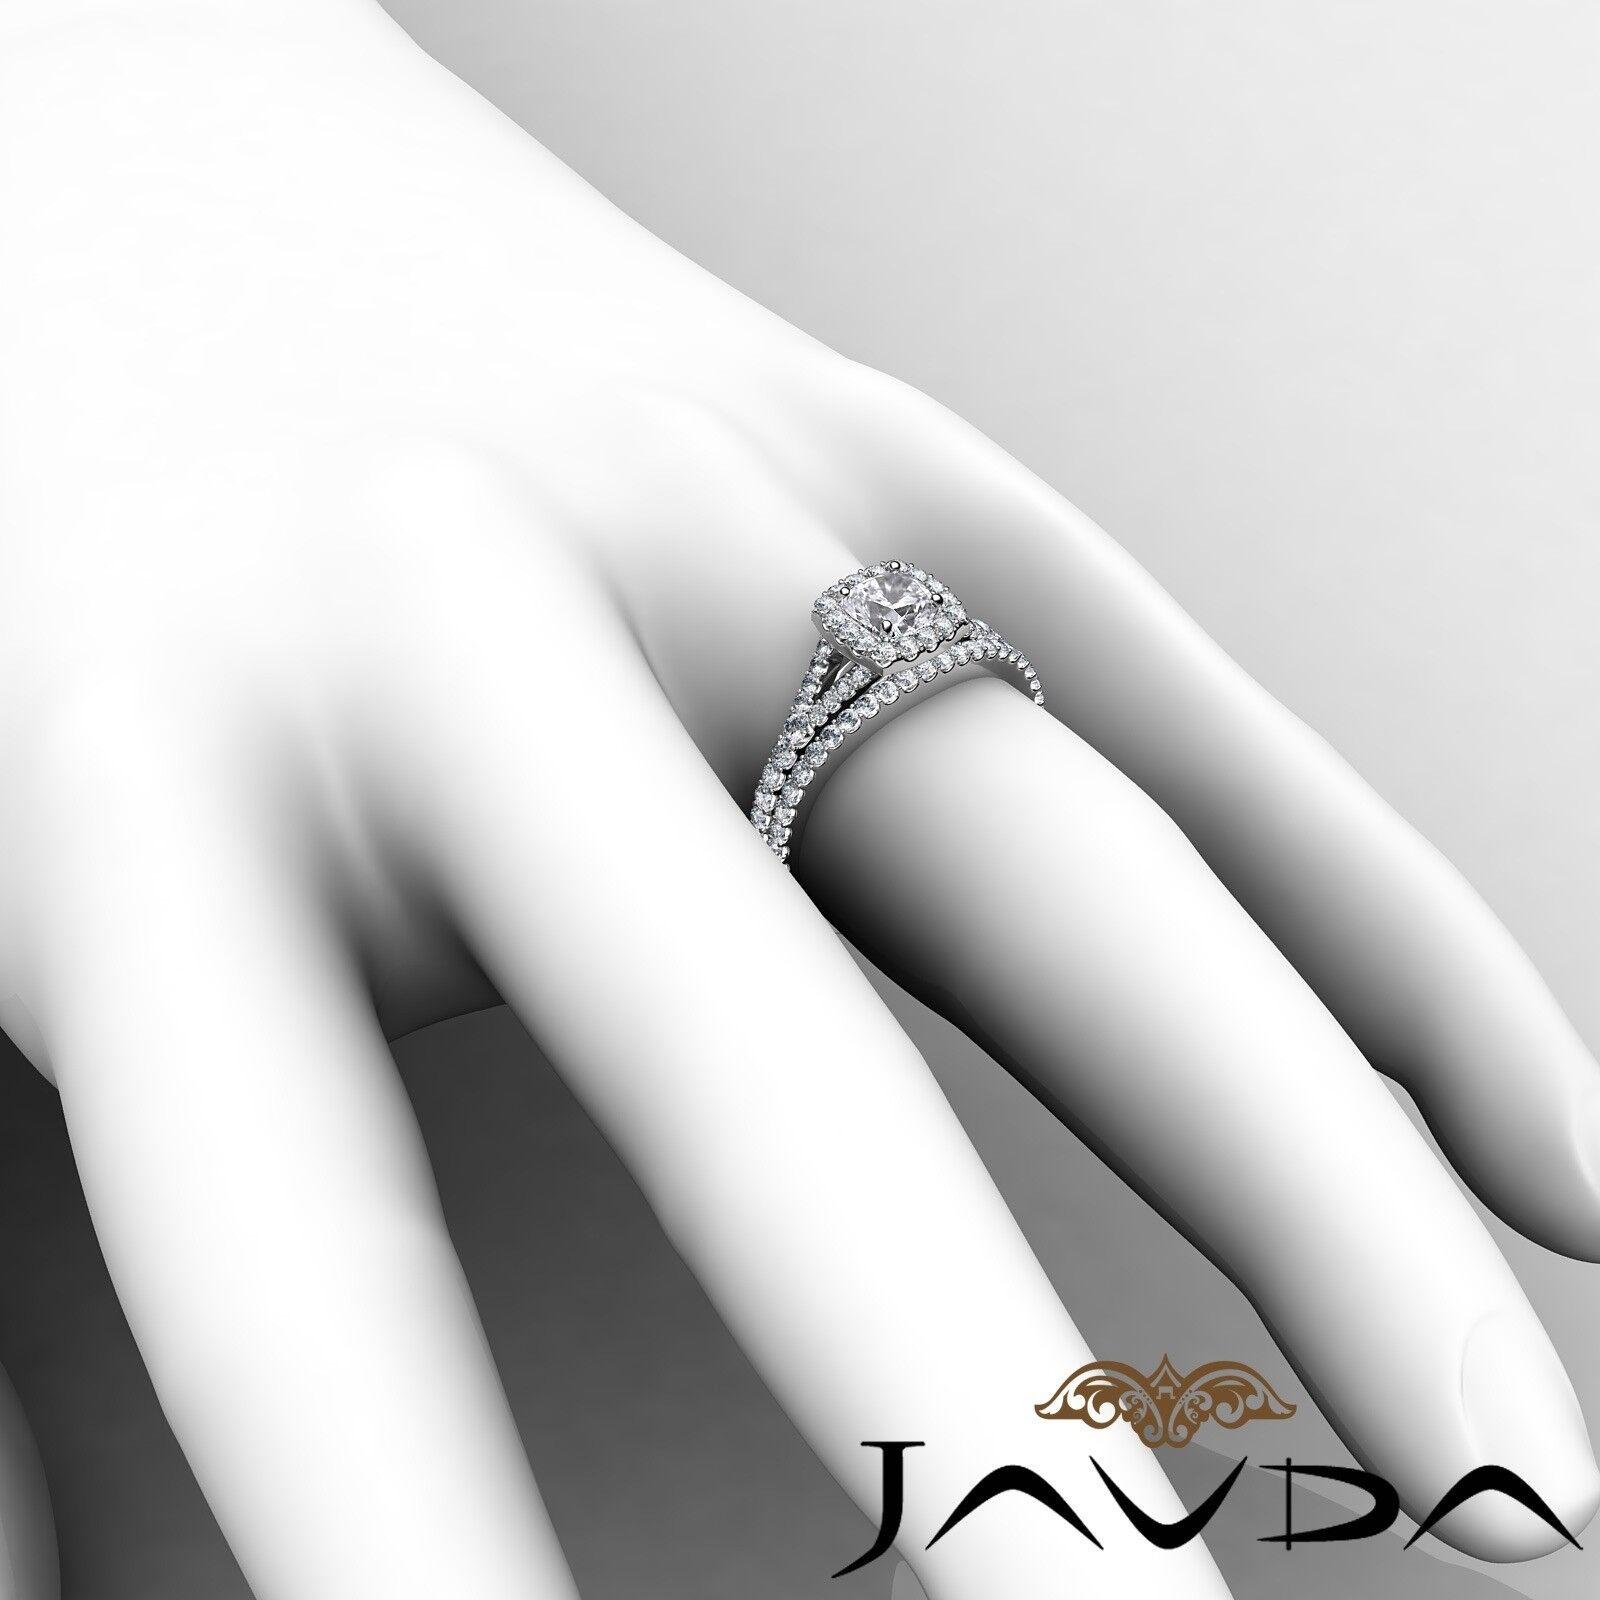 1.55ctw U Cut Pave Halo Bridal Cushion Diamond Engagement Ring GIA F-VVS2 W Gold 6